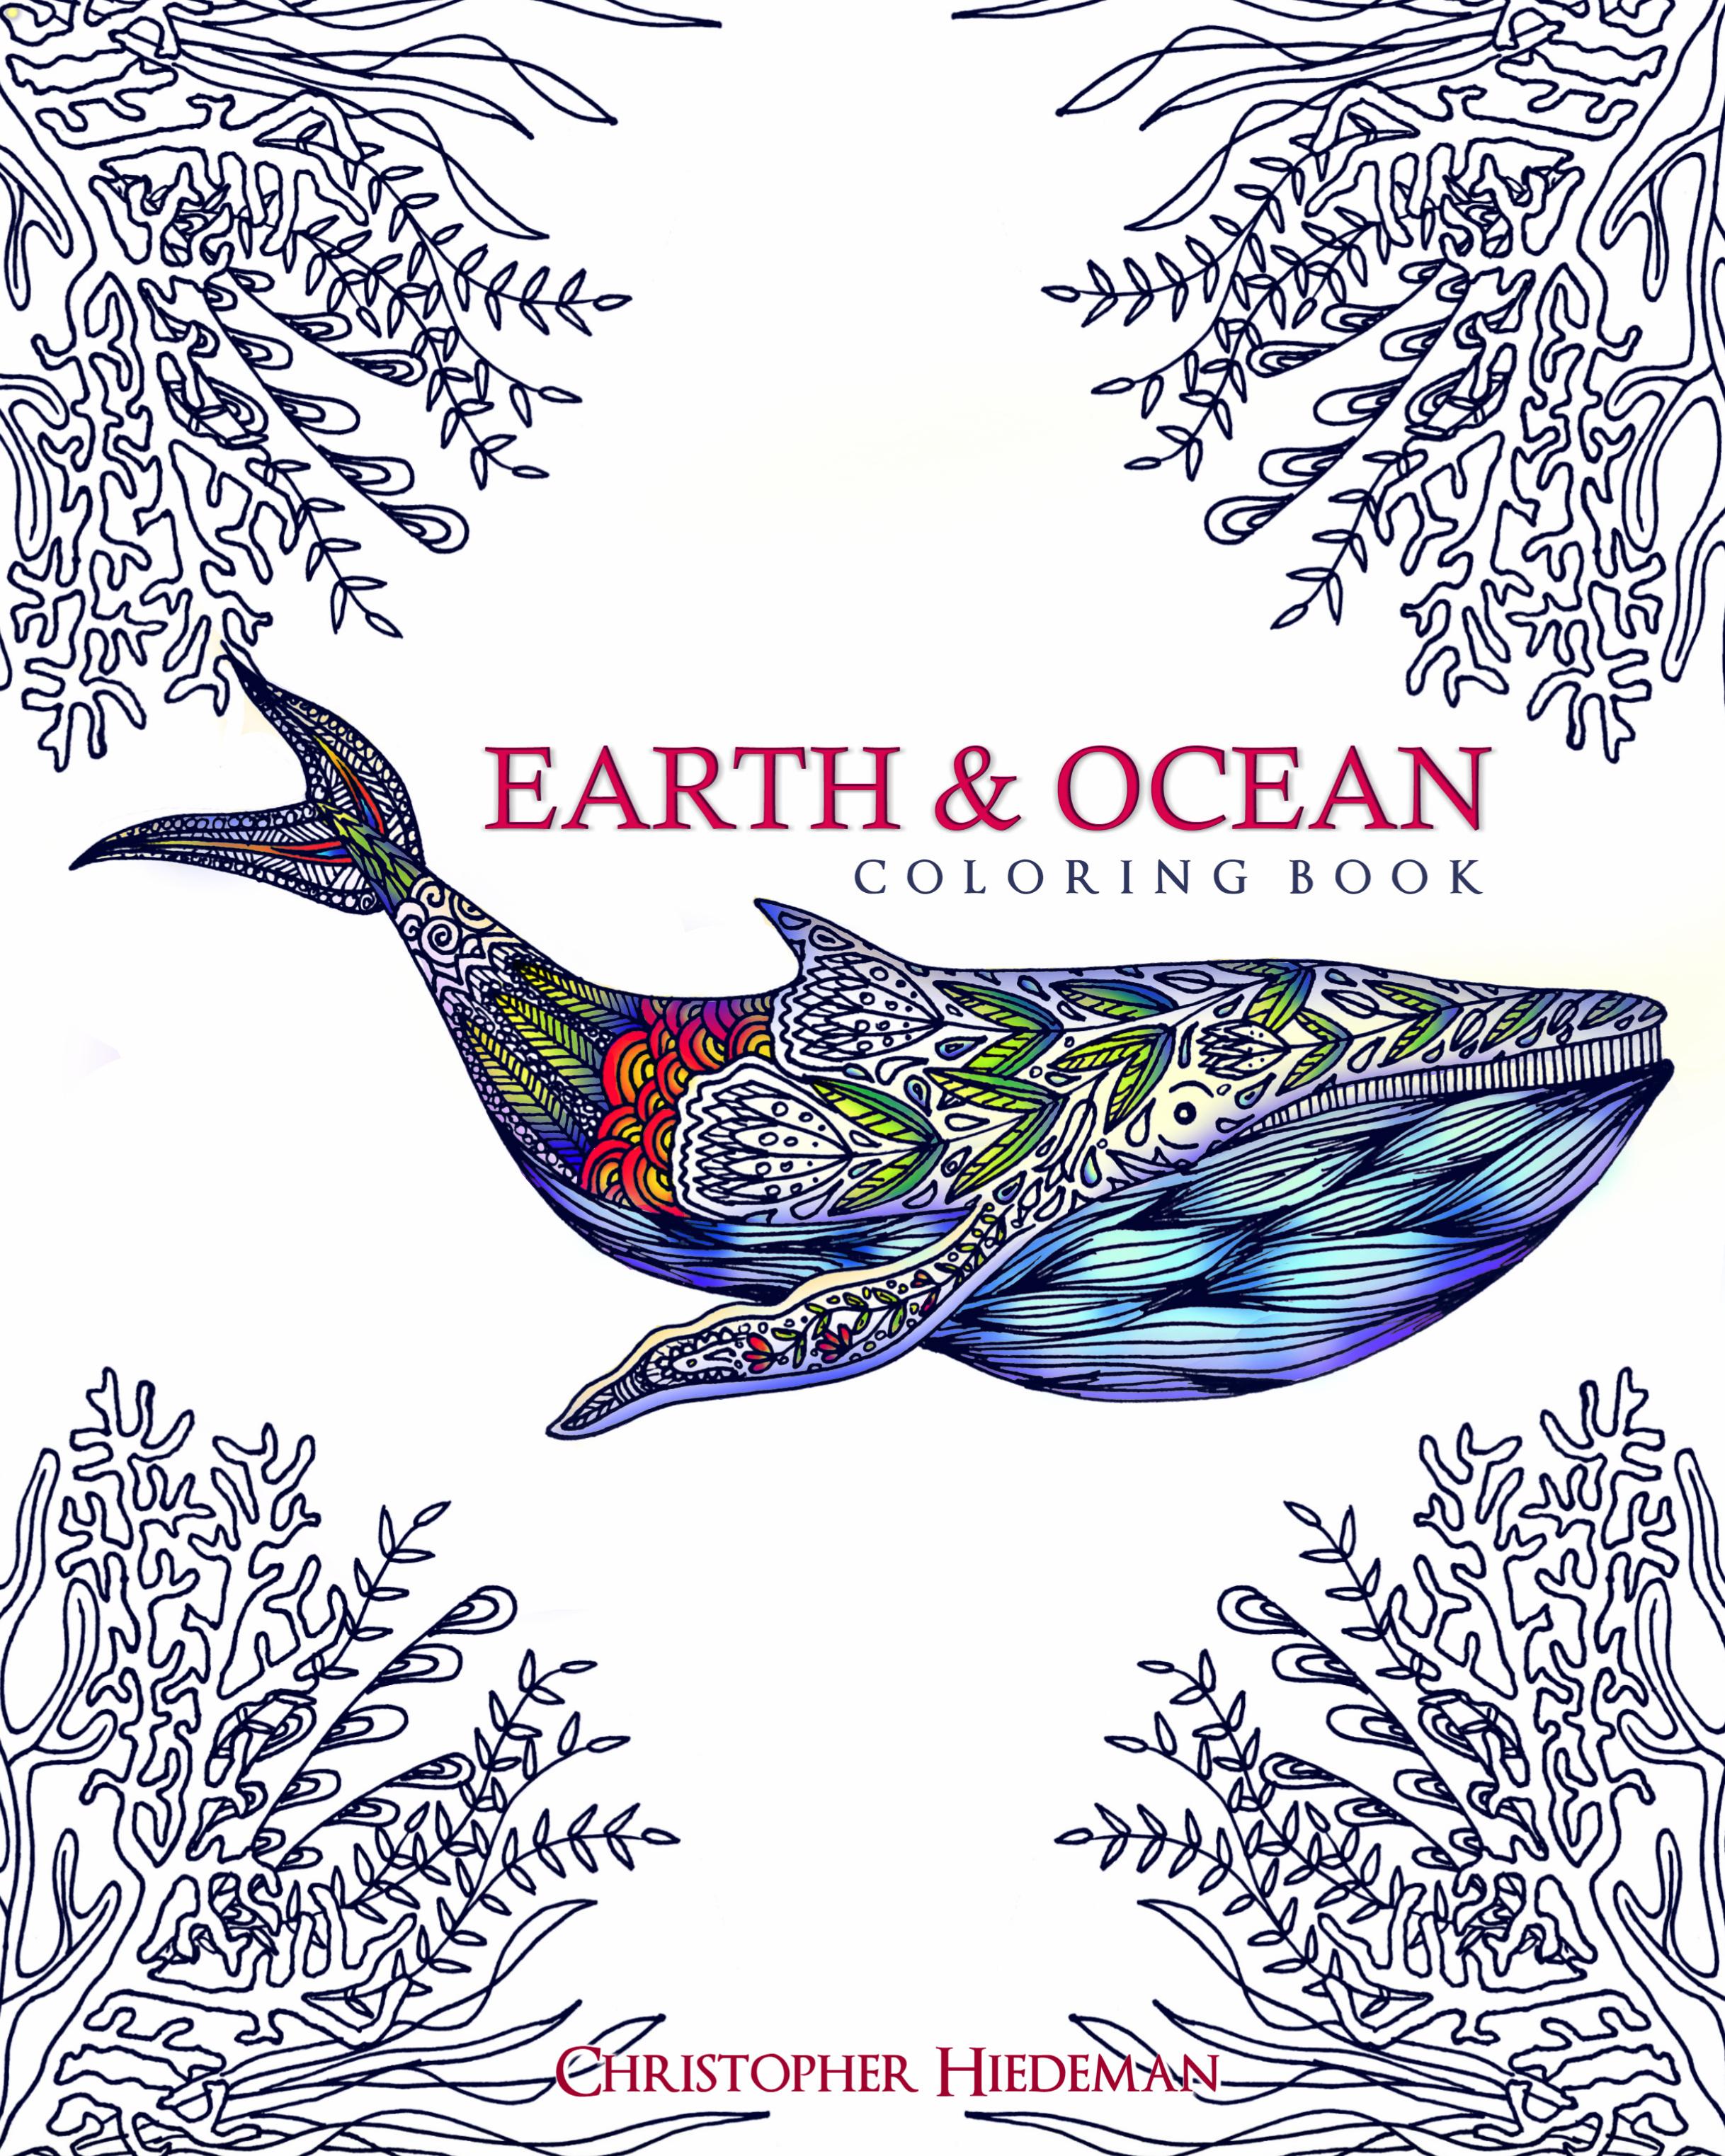 Earth & Ocean Coloring Book